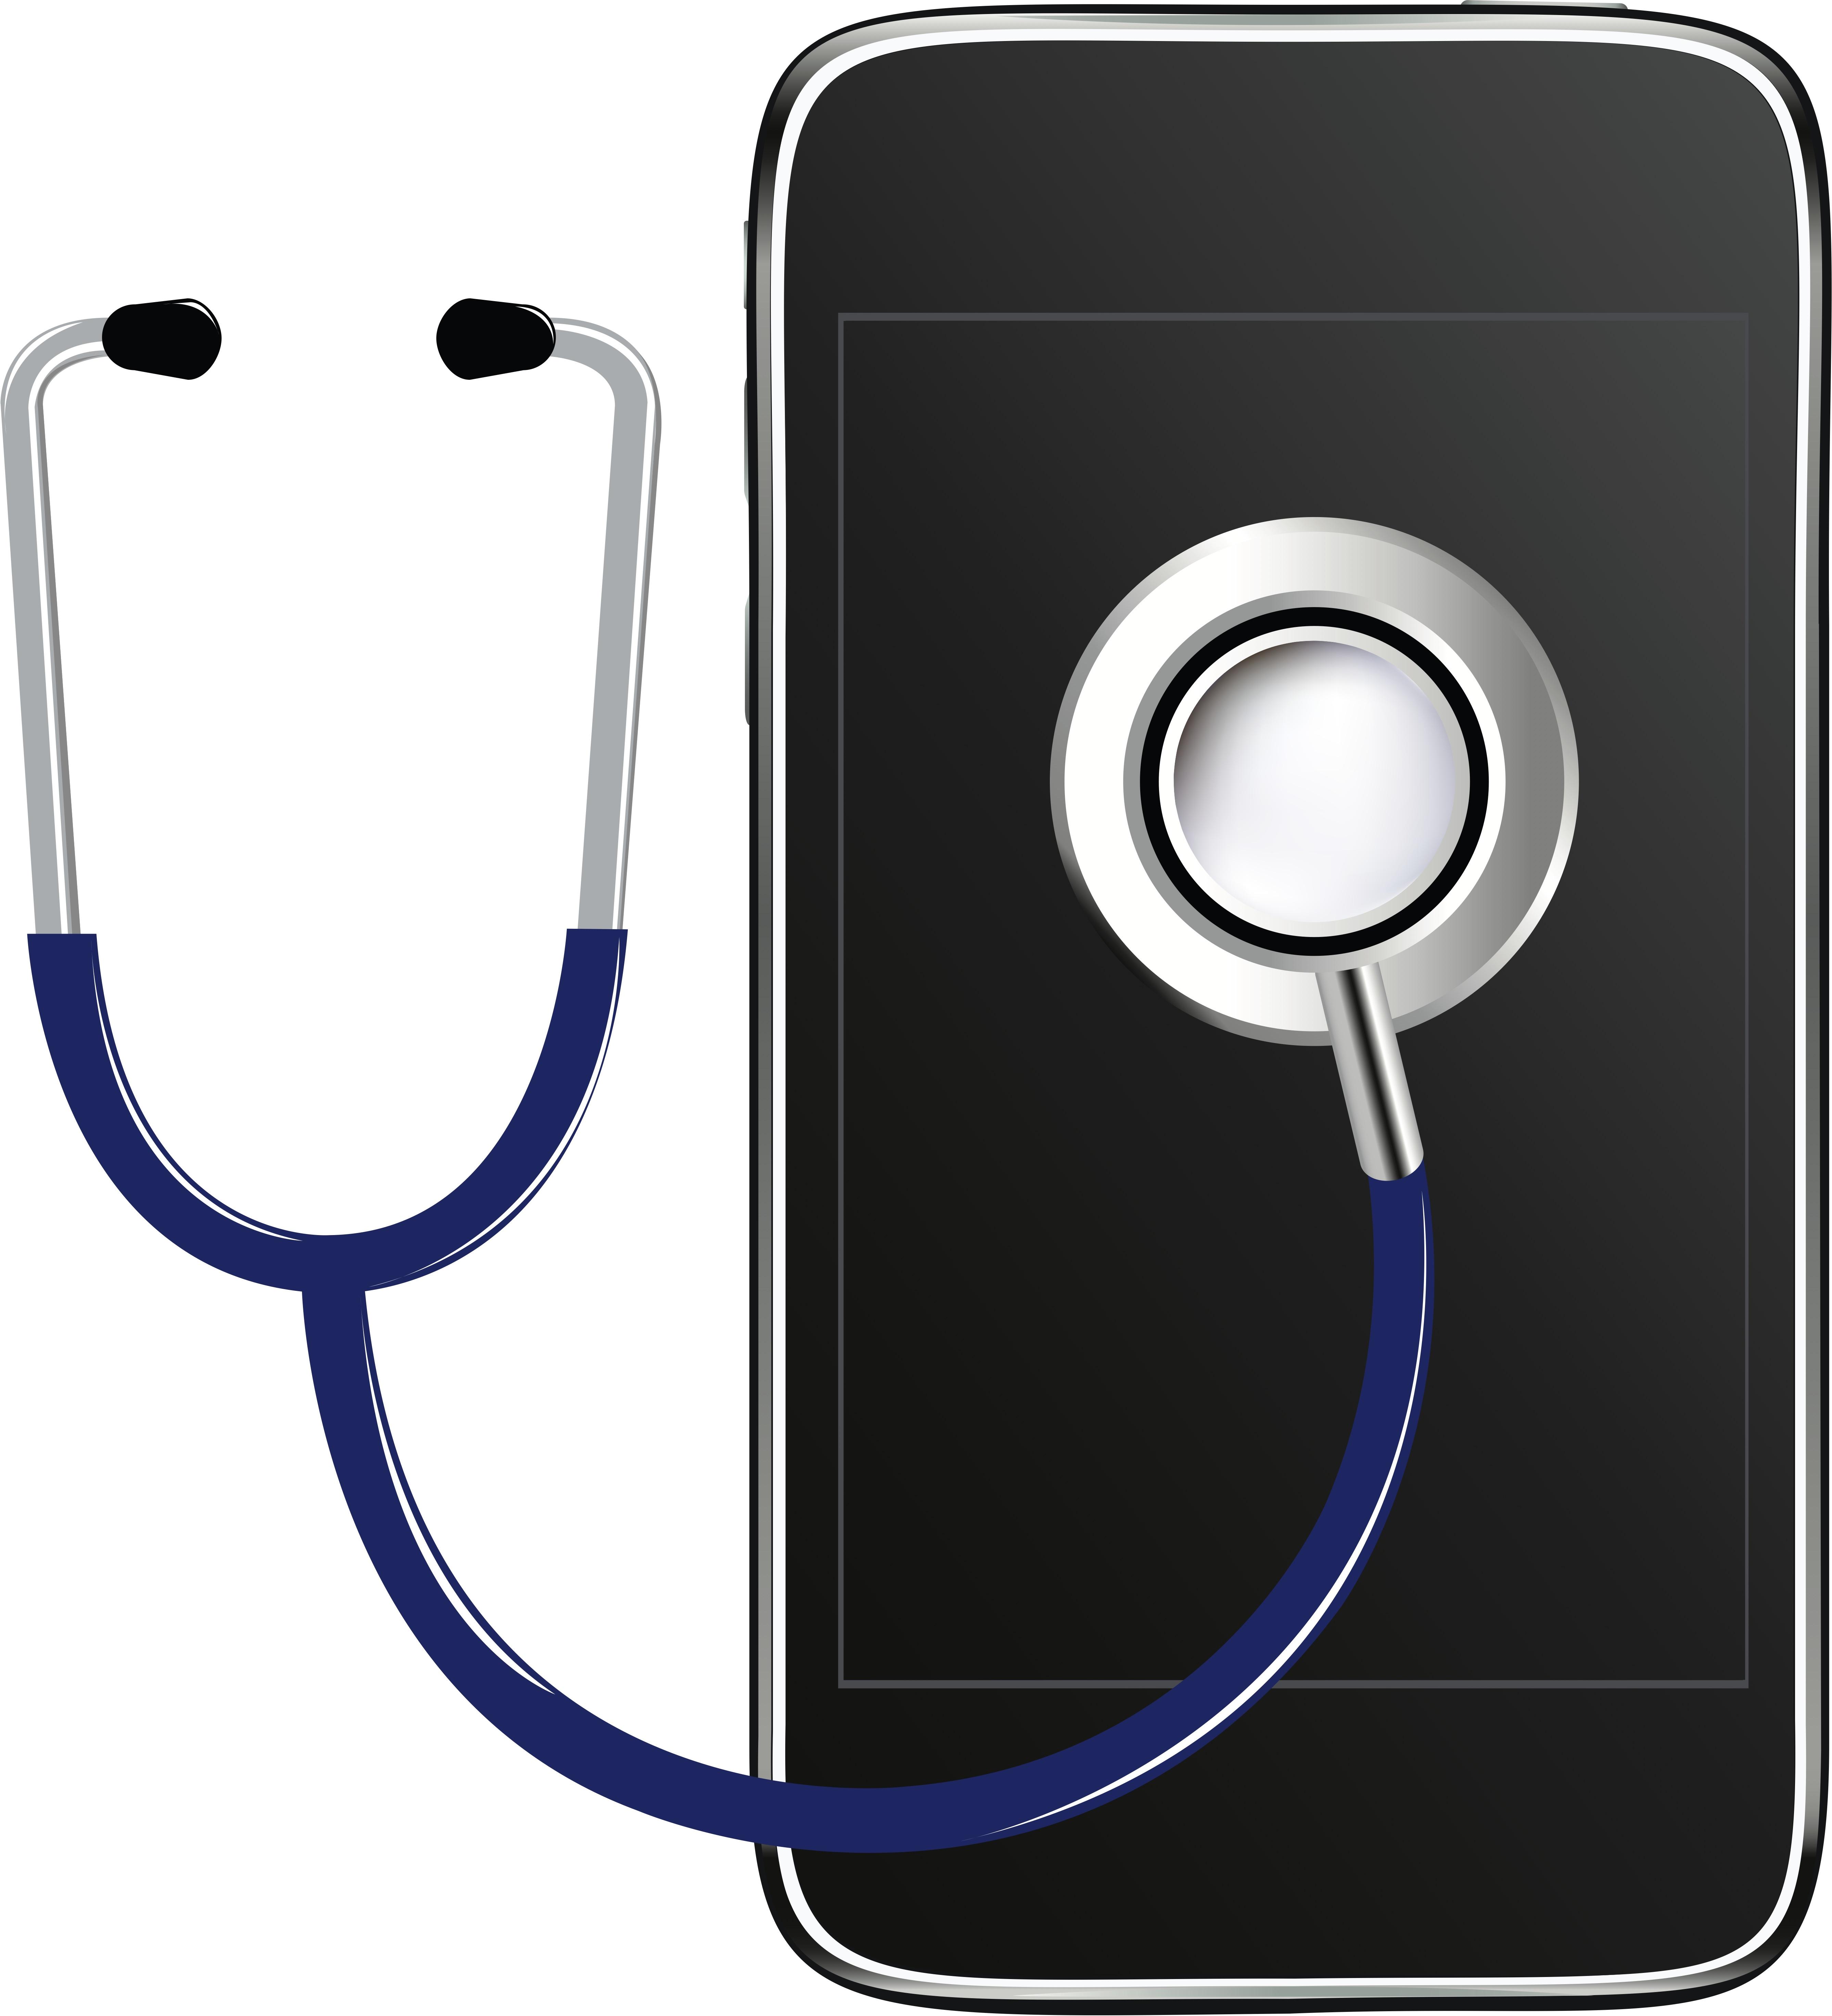 stethoscope iphone